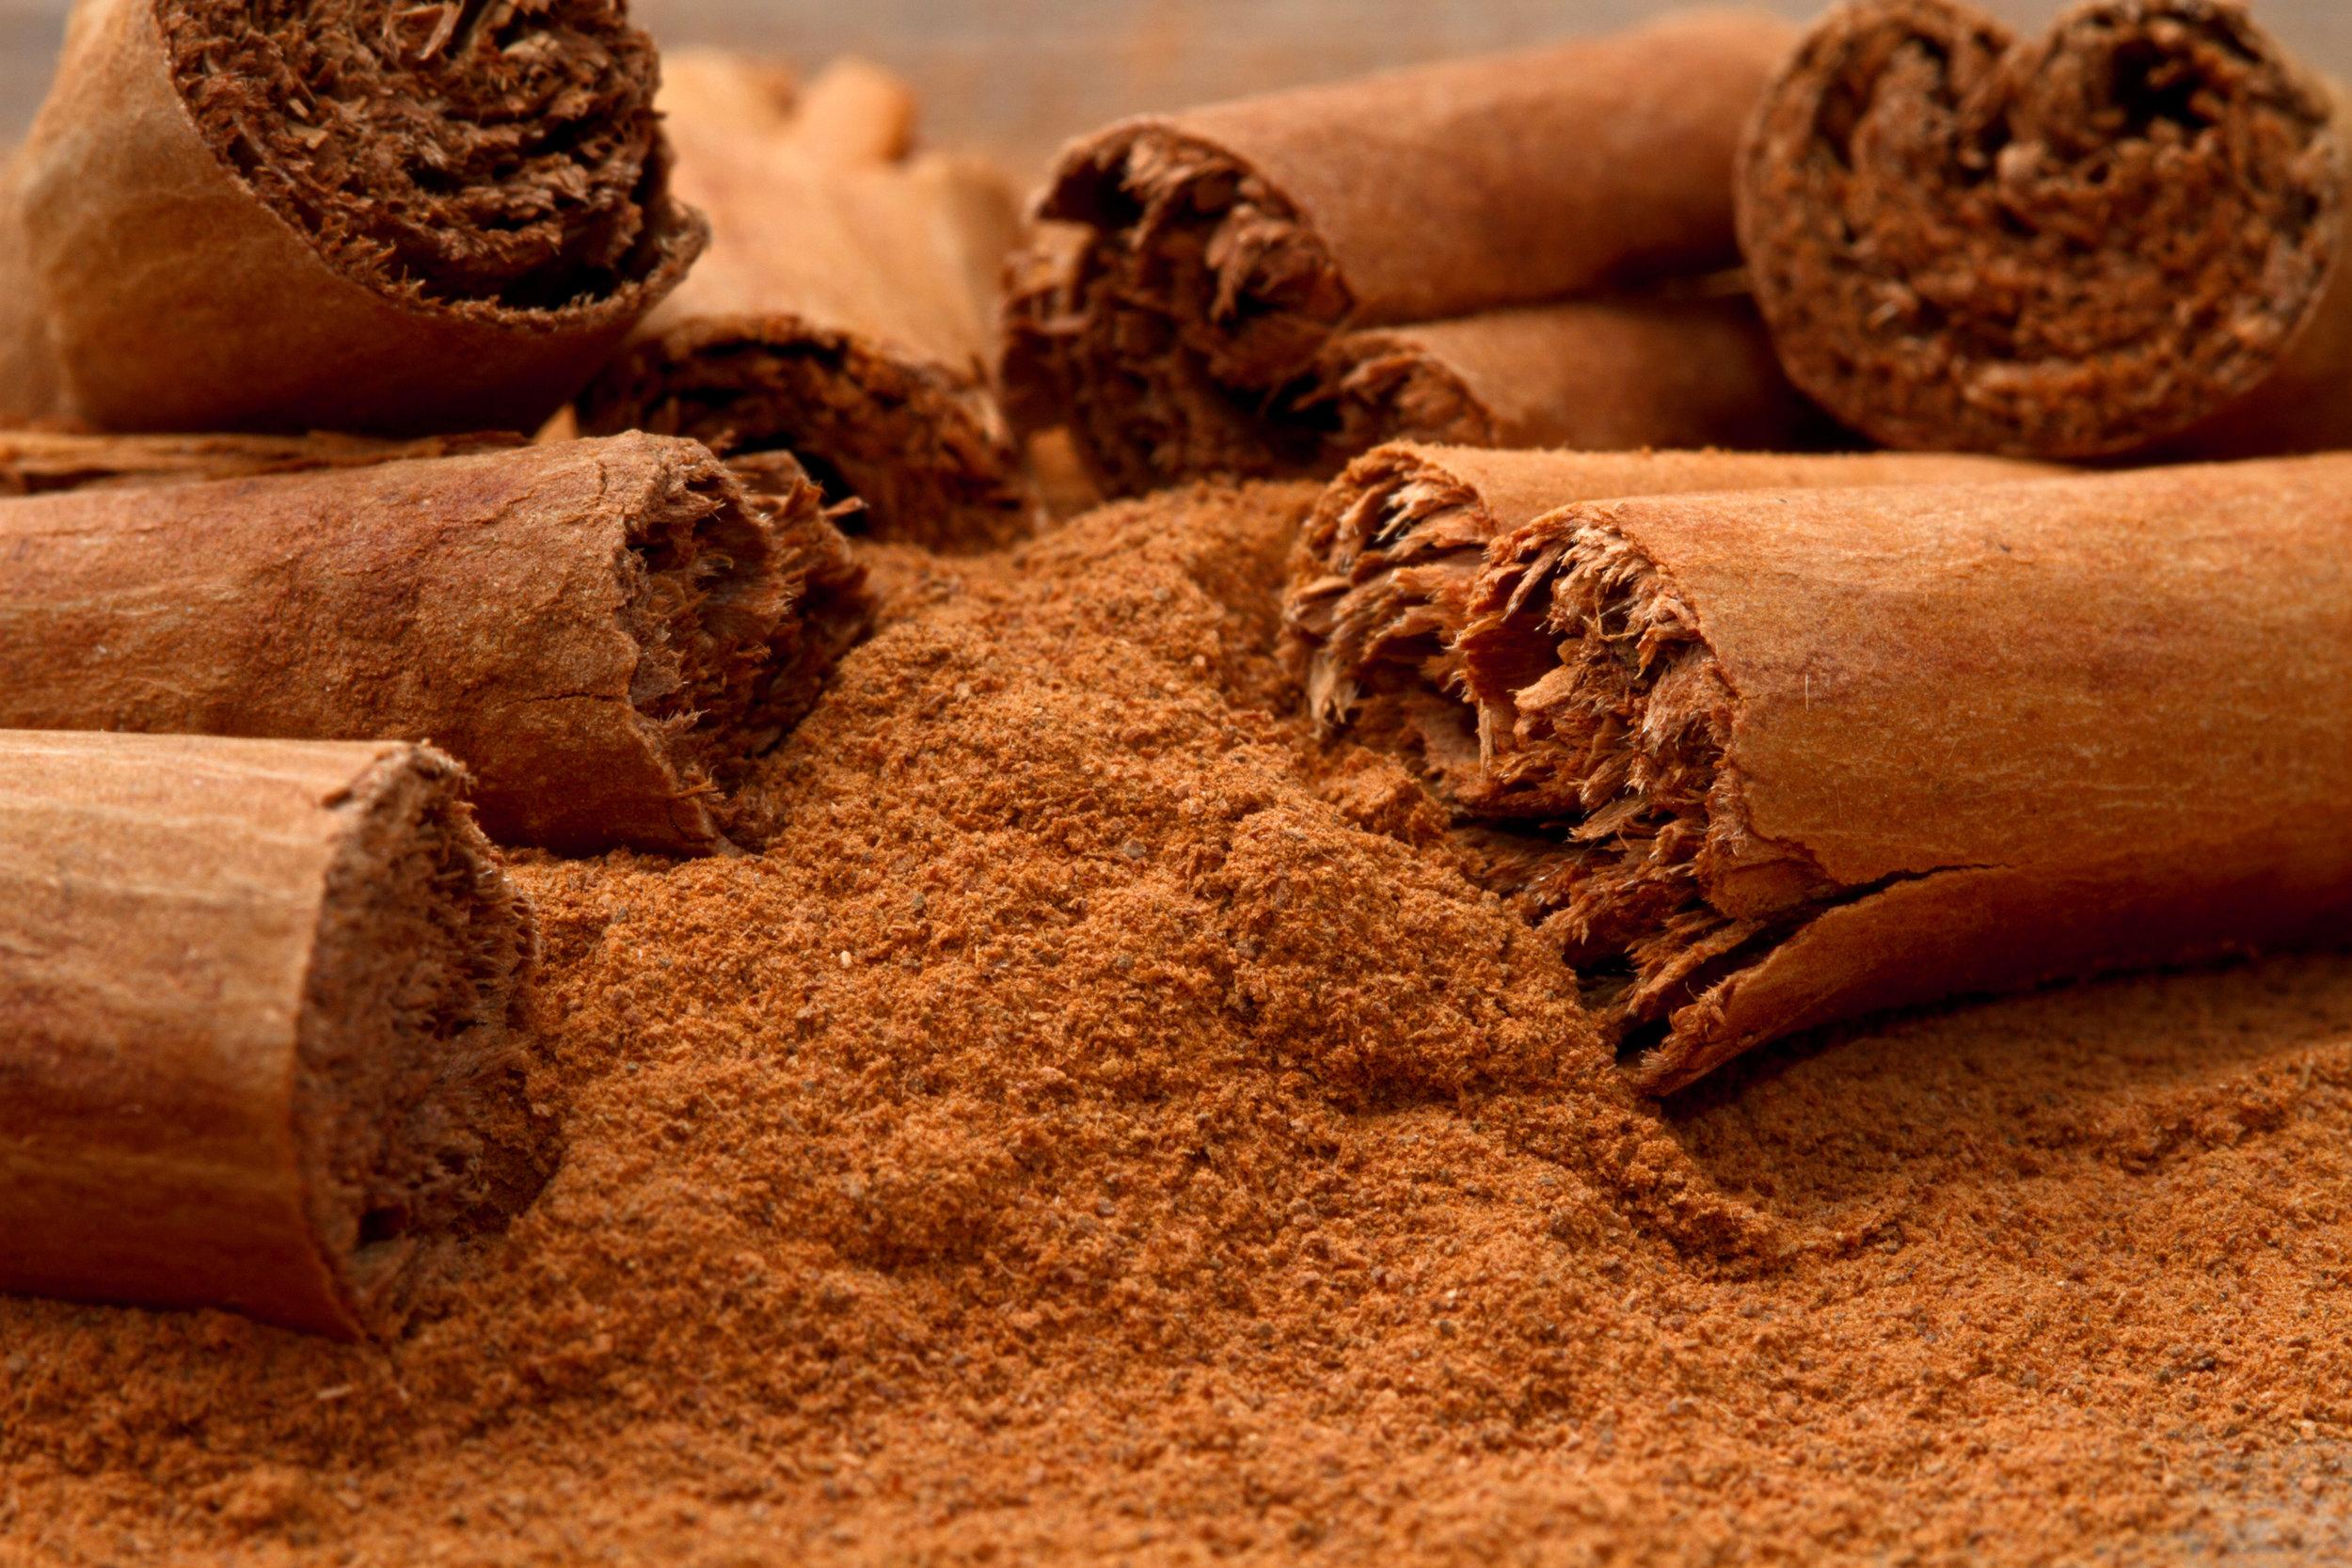 cinnamon sticks.jpg